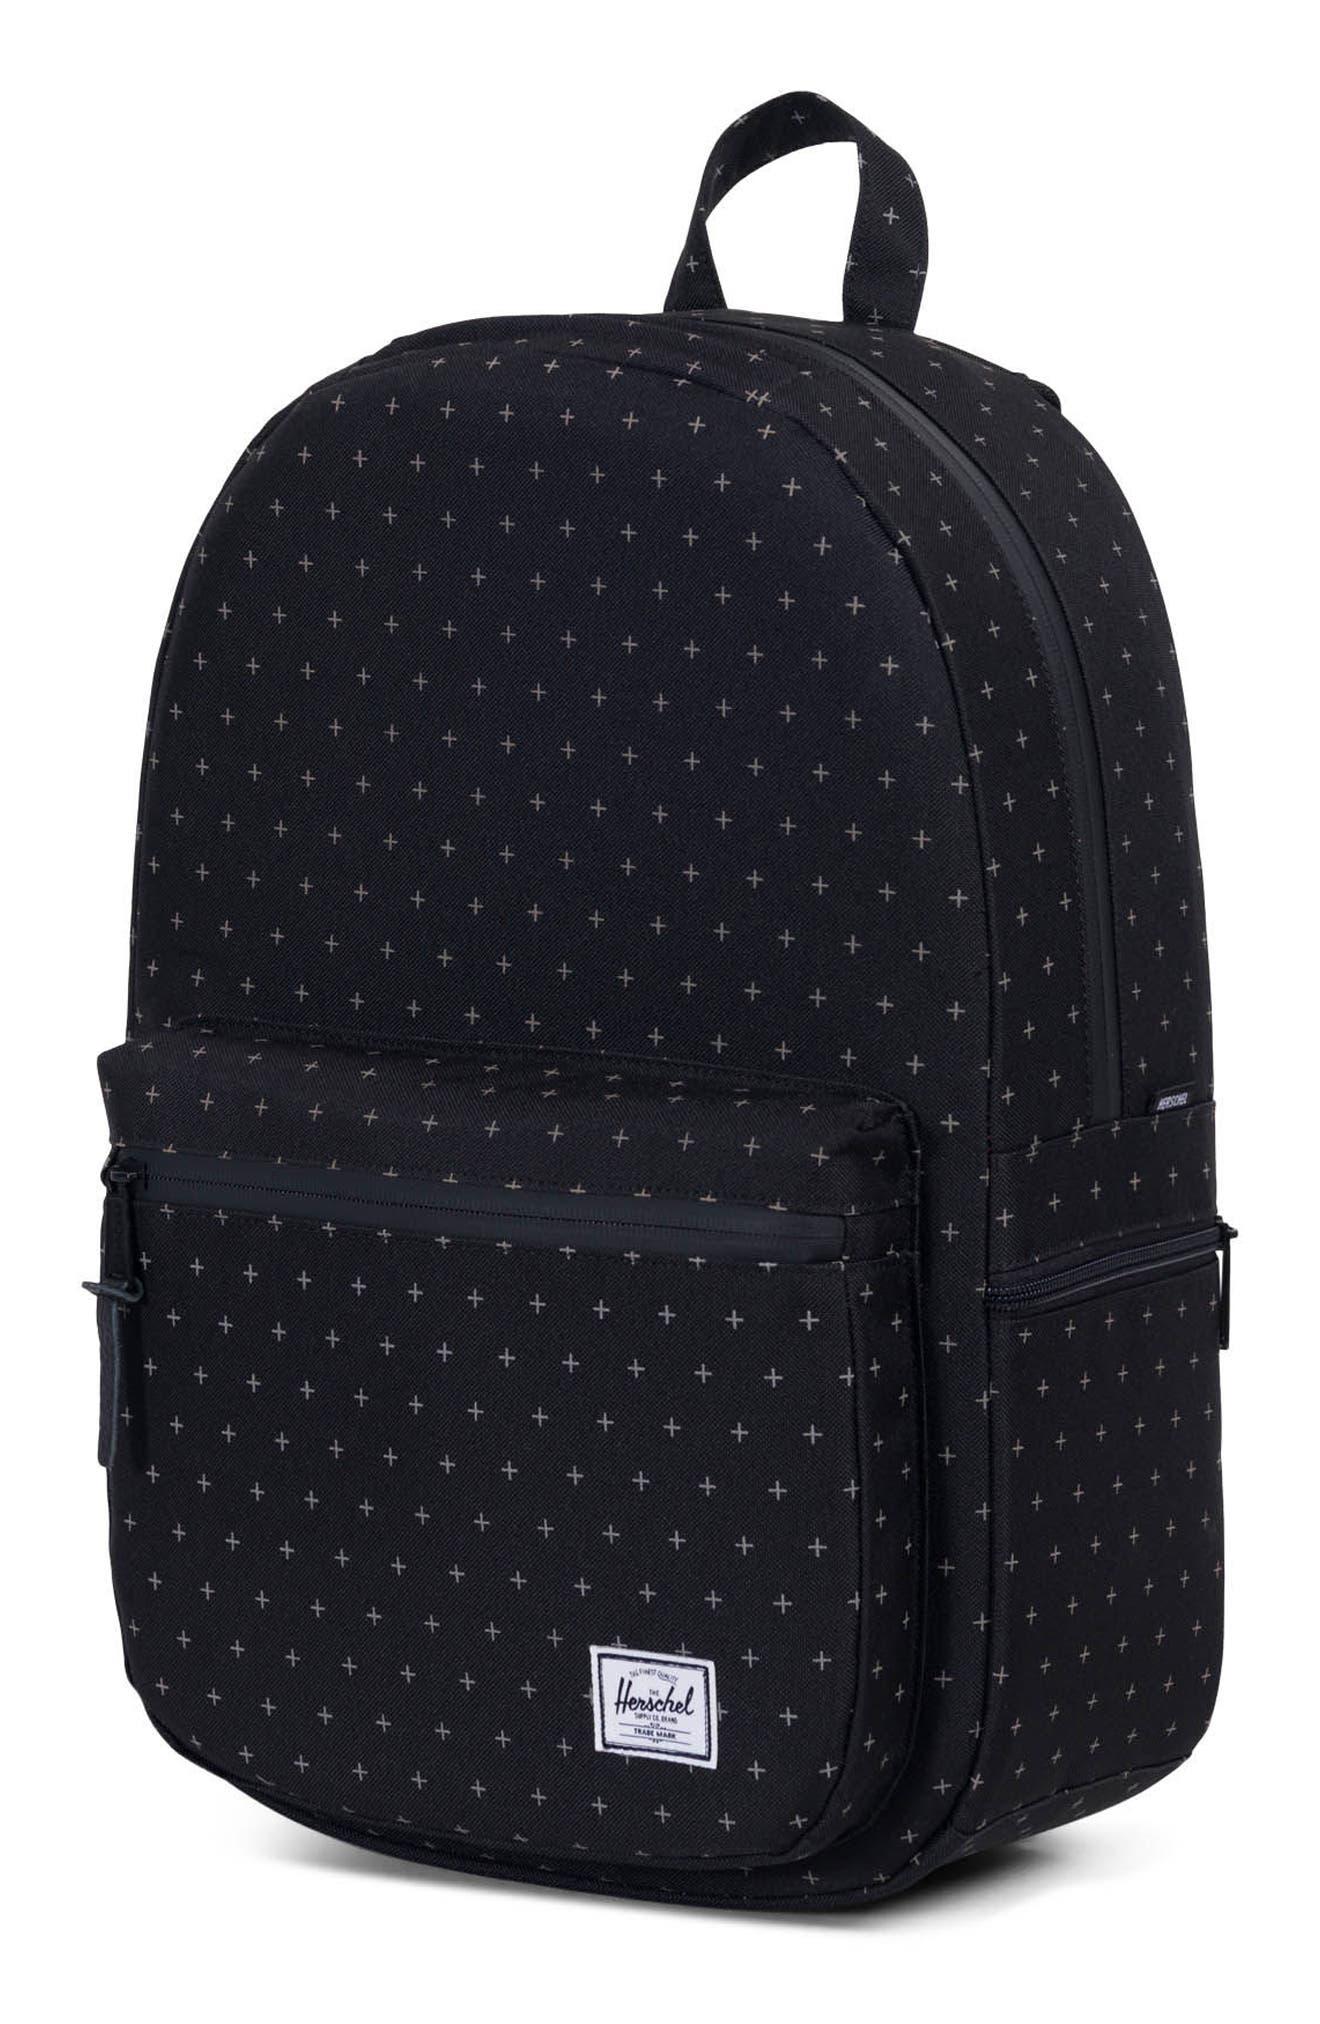 Harrison Backpack,                             Alternate thumbnail 4, color,                             Black Gridlock